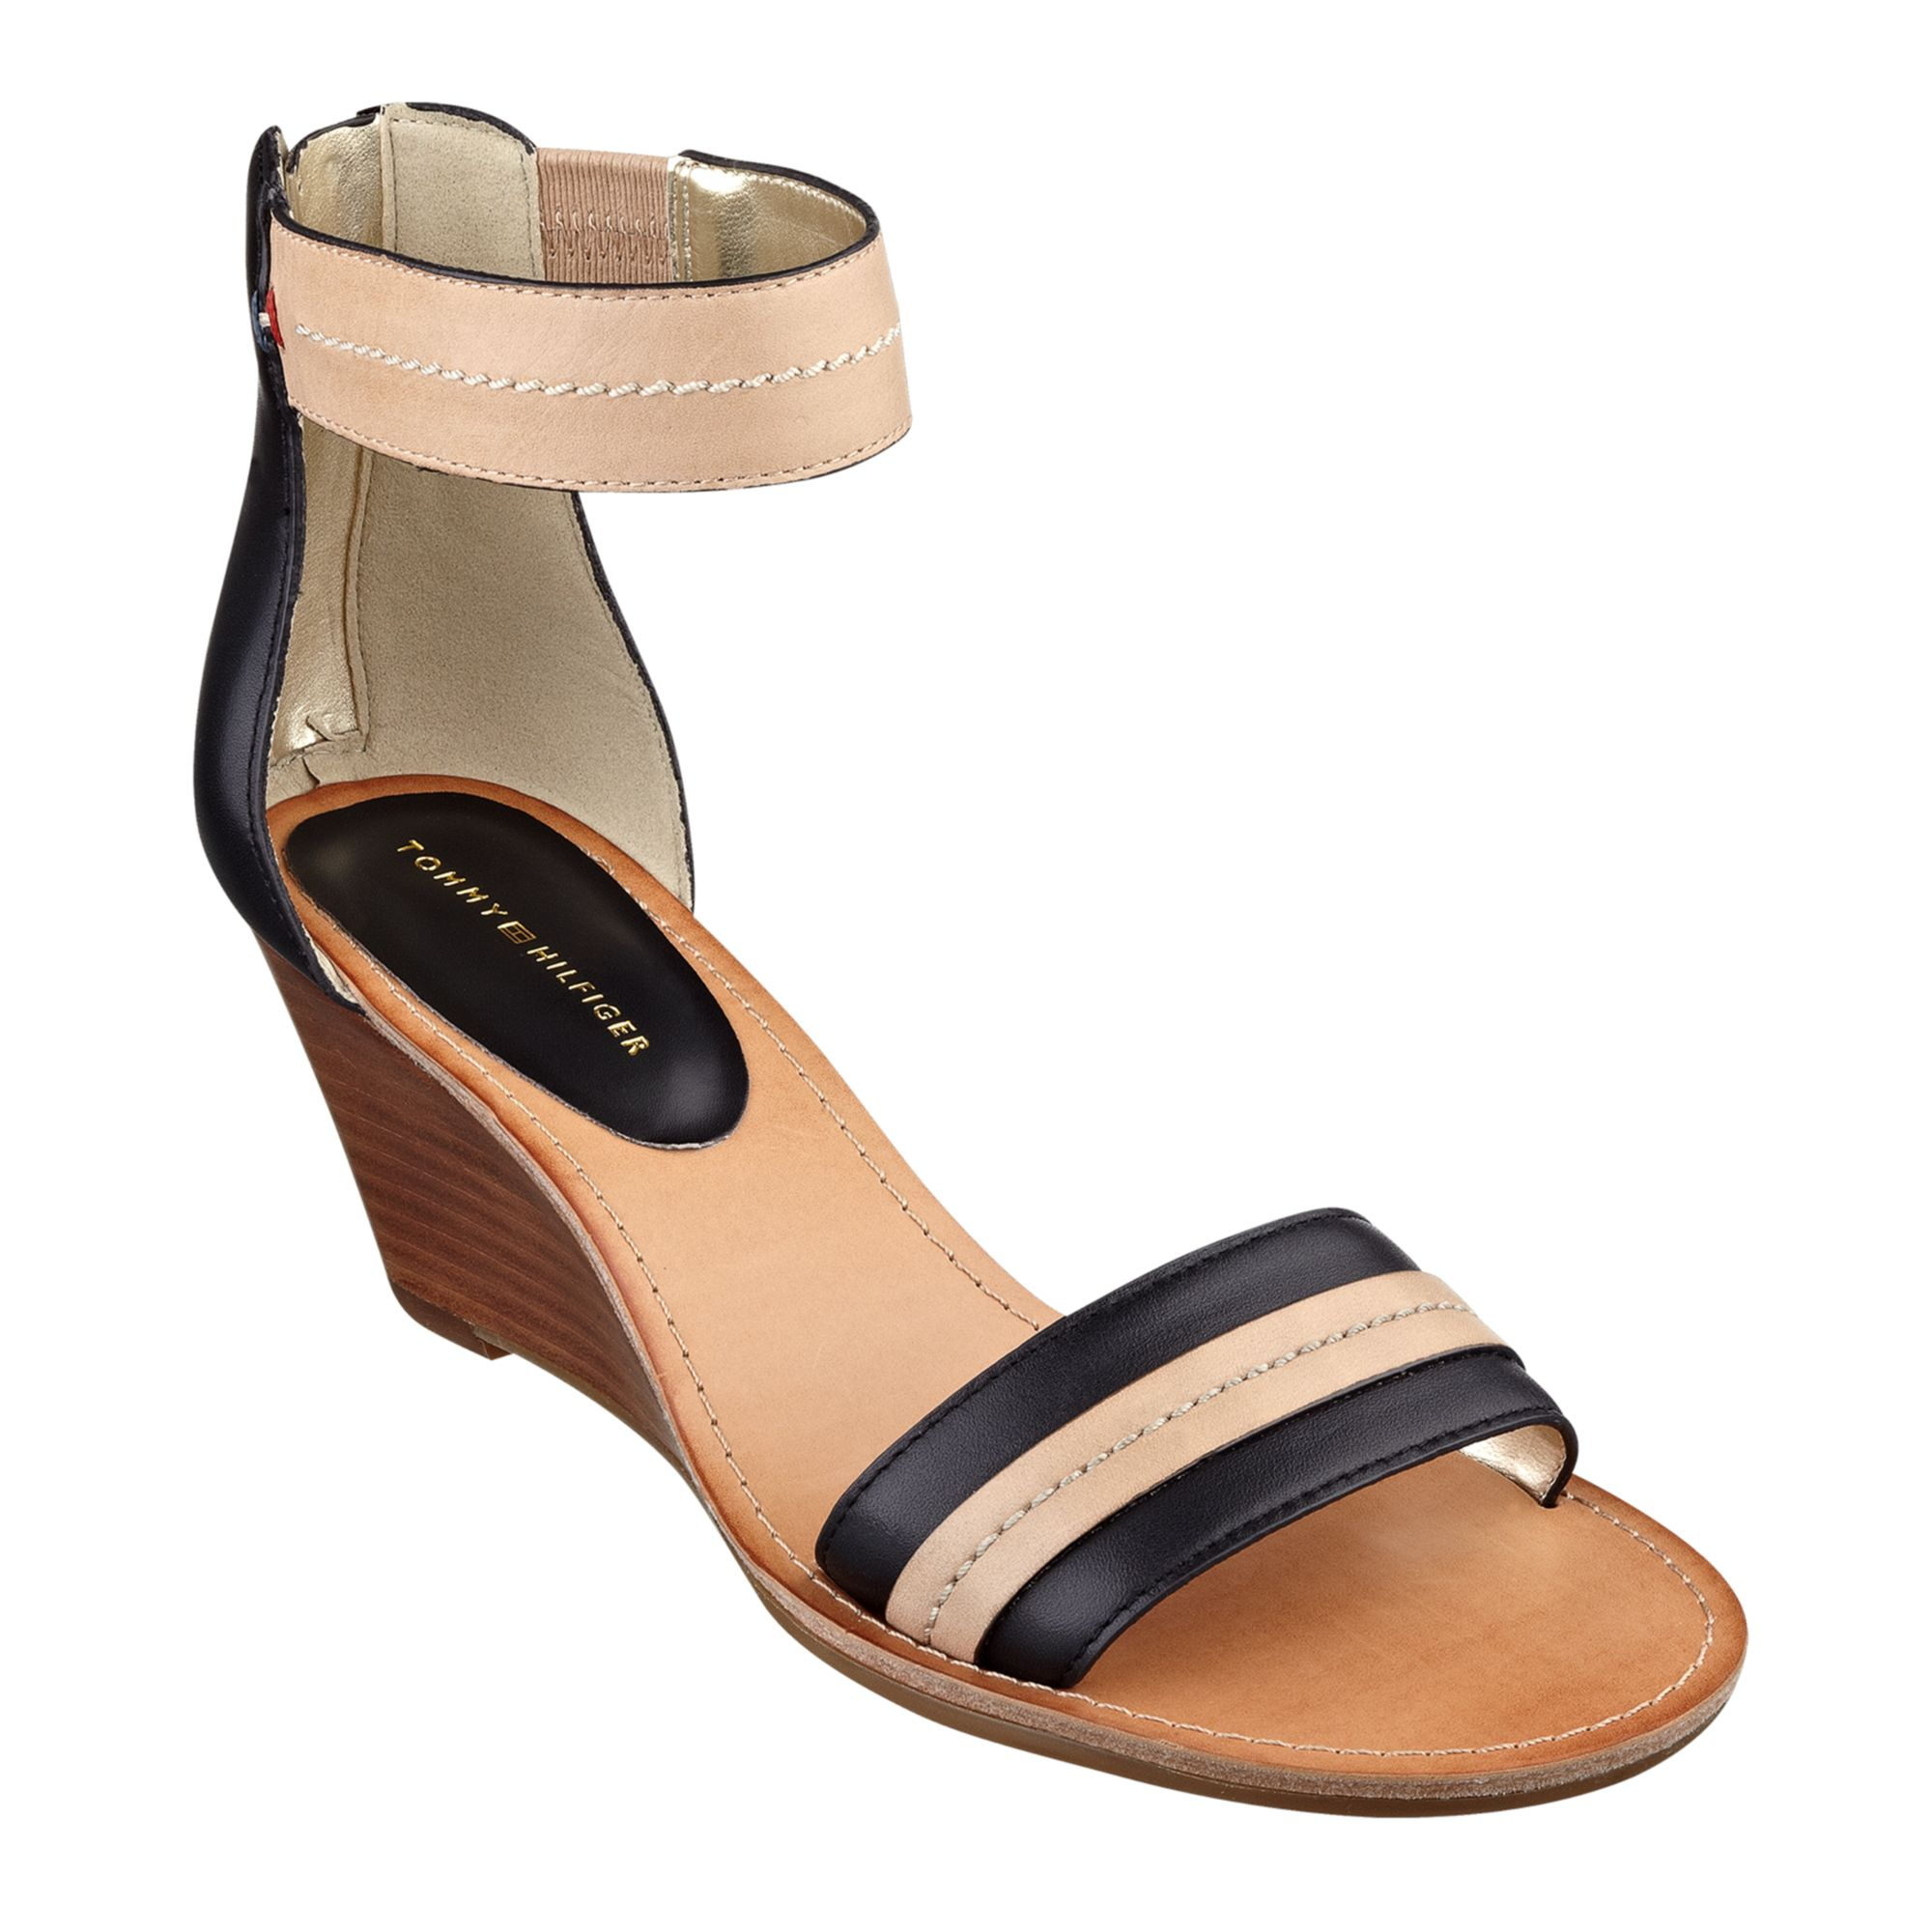 62420302b2597 Lyst - Tommy Hilfiger Women S Yara Akle Strap Wedge Sandals in Black